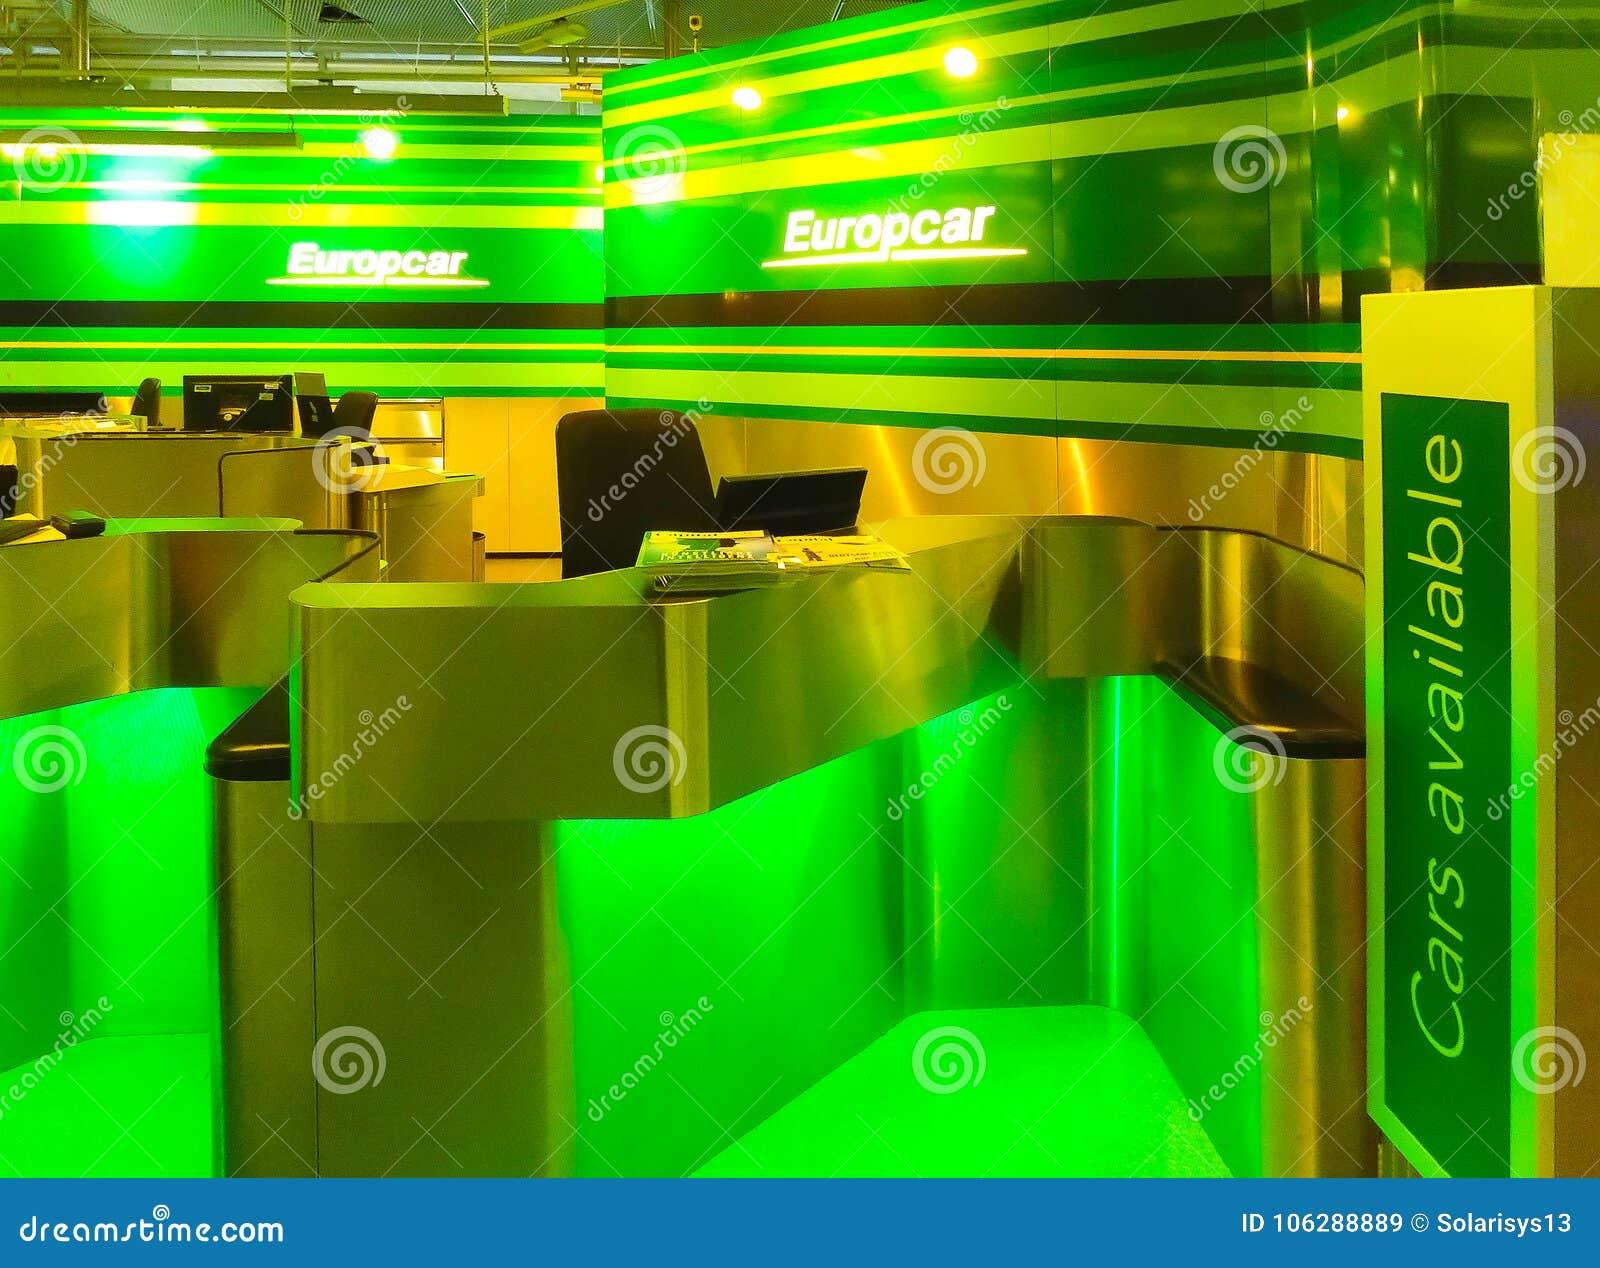 Cologne Germany December 12 2017 Europcar Car Rental Employee